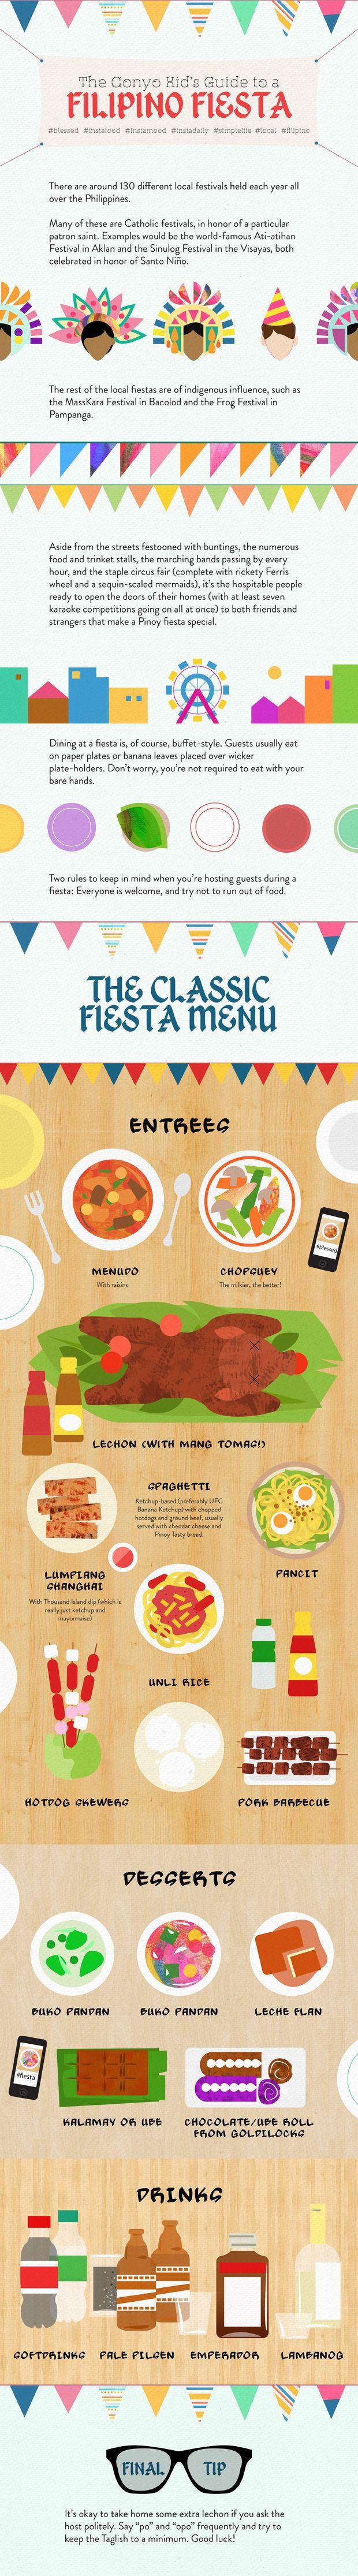 The Conyo Kid's Guide to a Filipino Fiesta